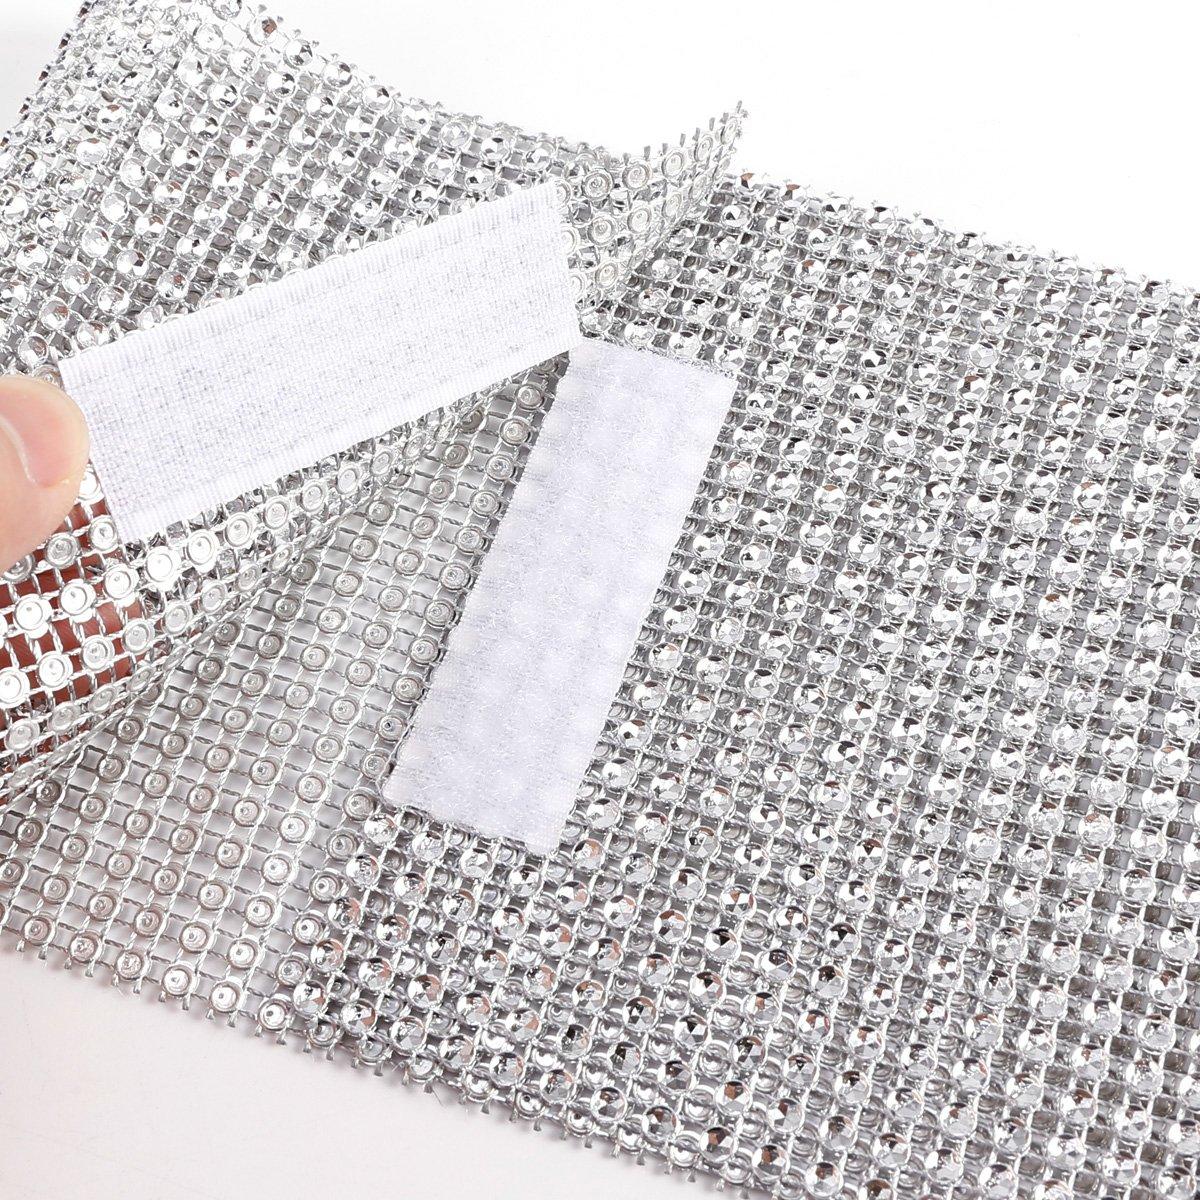 Anladia Home Decorative Holdback Diamante Window Curtain Clip Silver Sparkling Tie Backs 2pcs 12cmx40cm